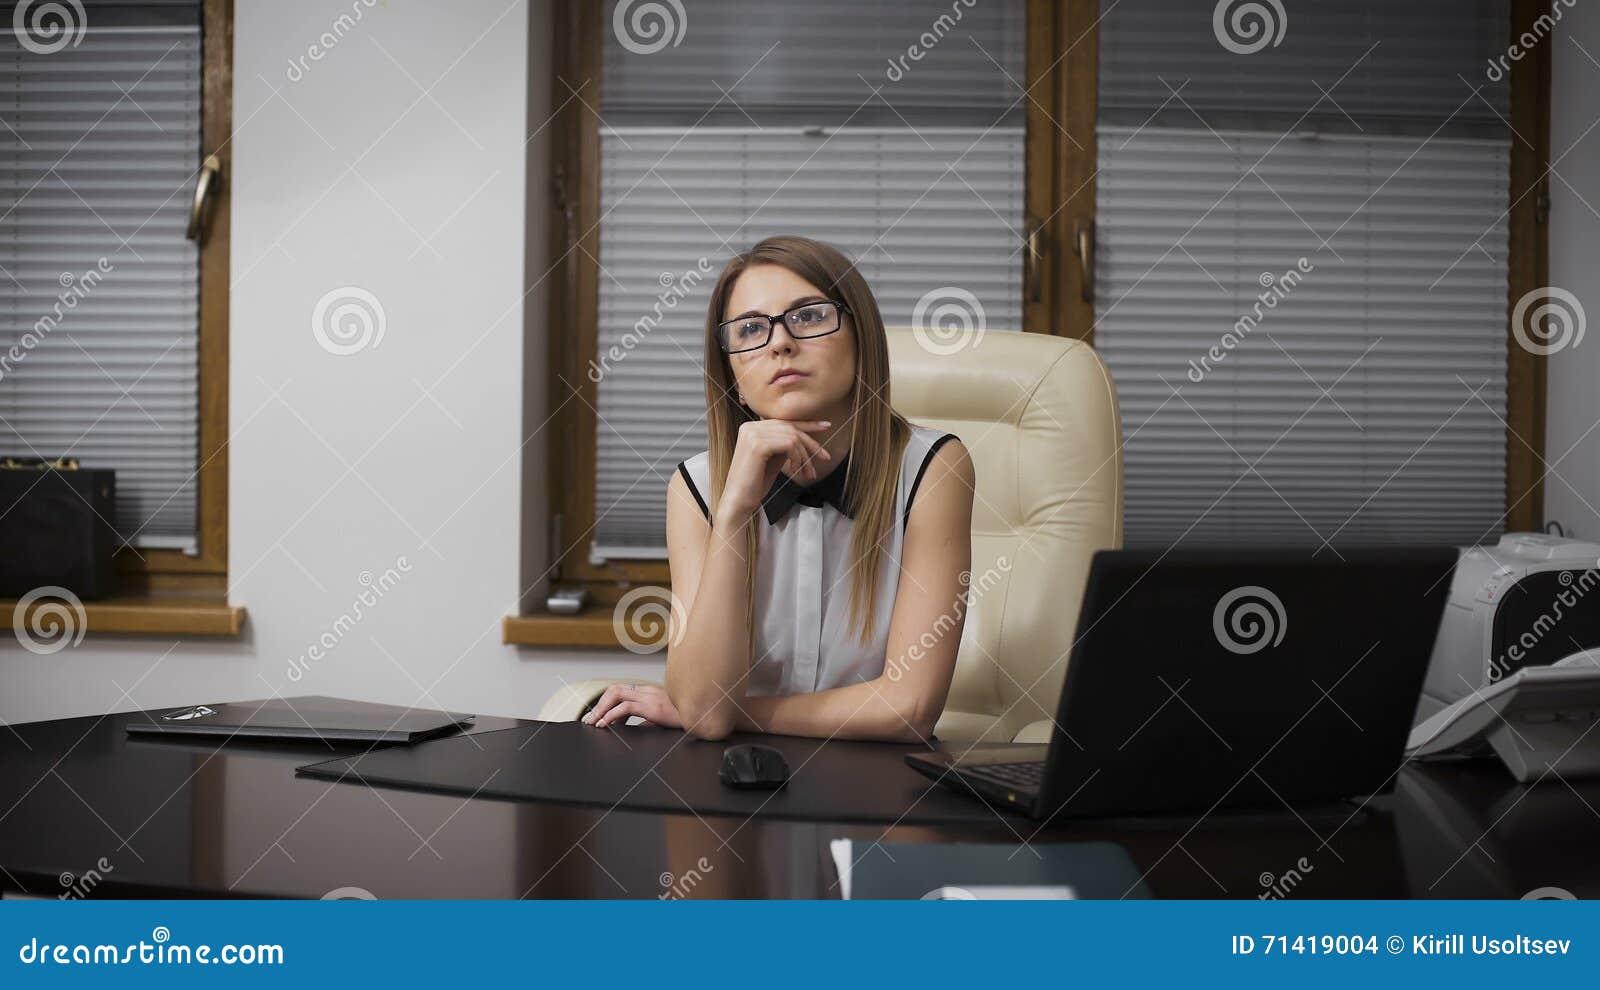 Secretary Selfie Desk Wwwmiifotoscom